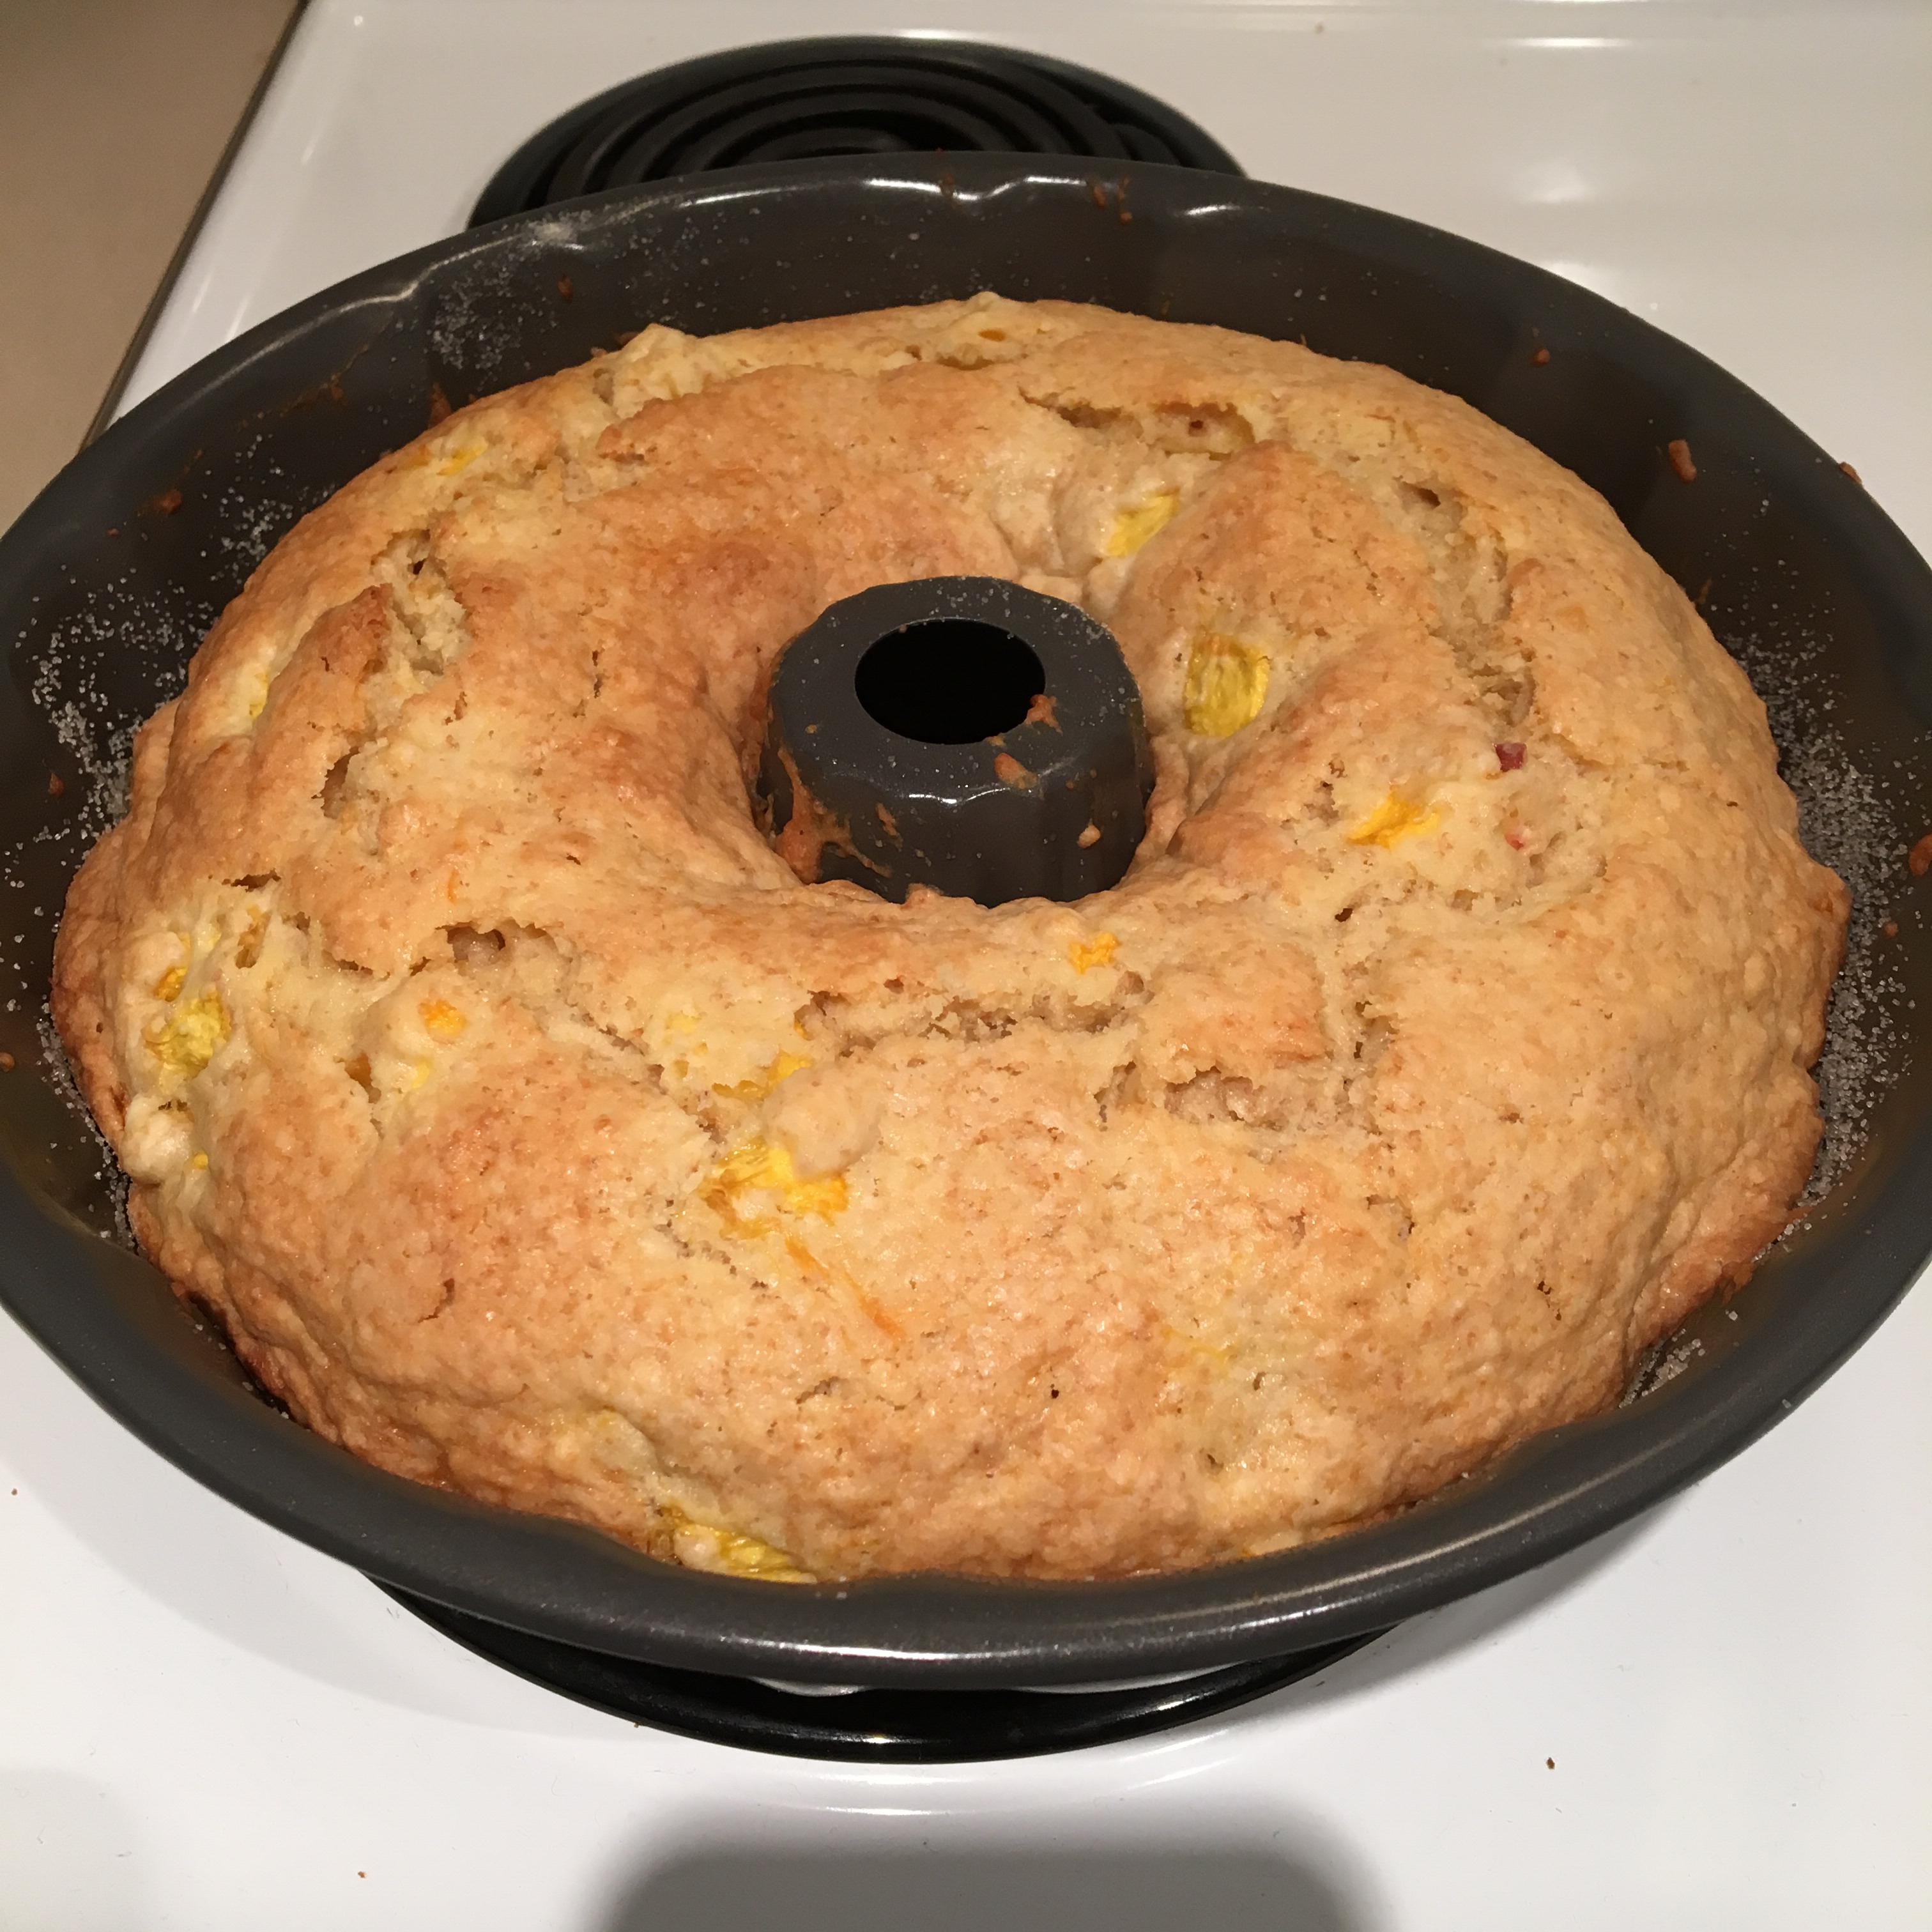 GA Peach Pound Cake David Weir